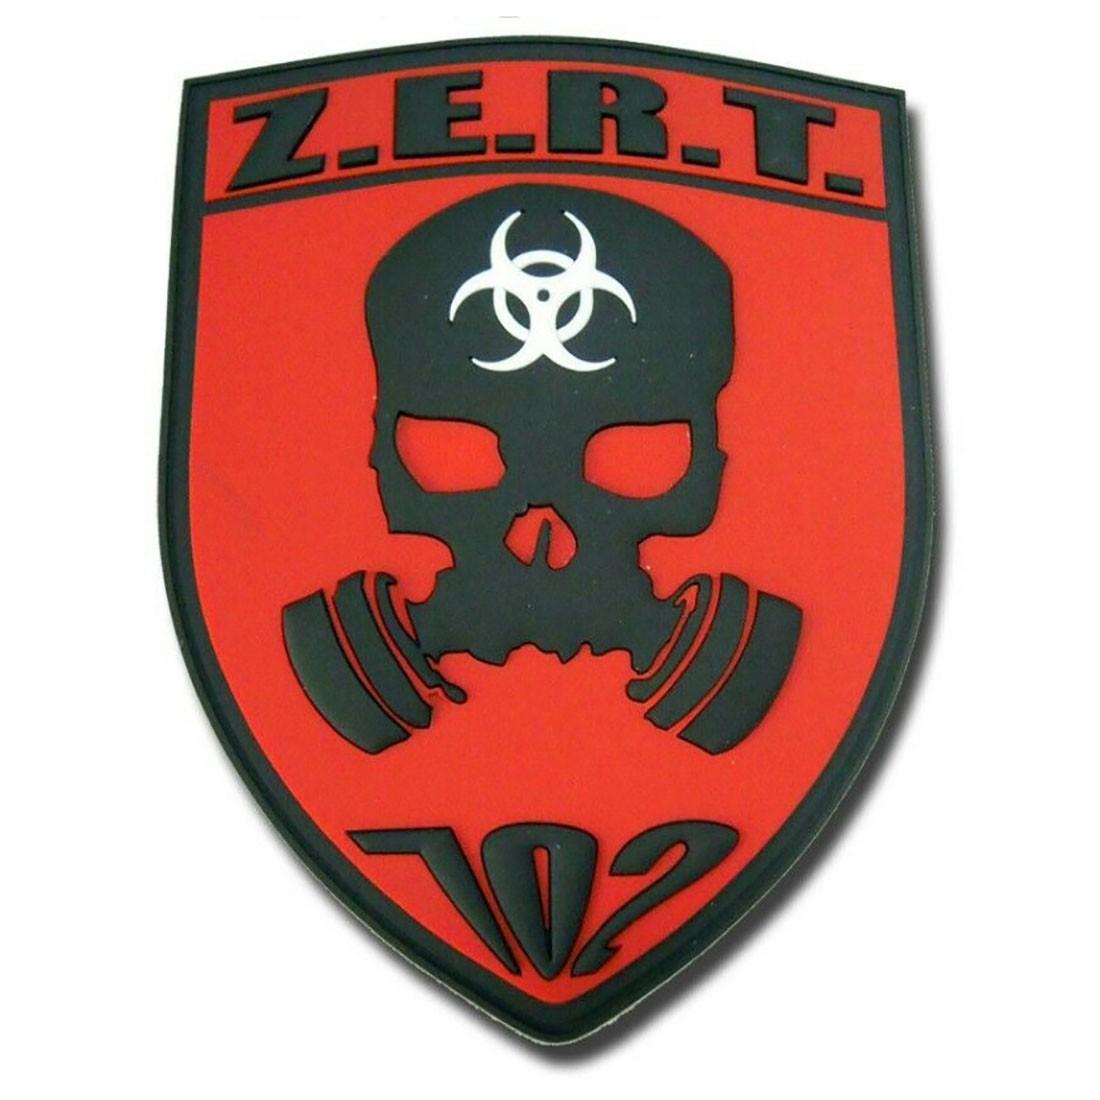 ZERT Tactical Rubber Velcro Patches